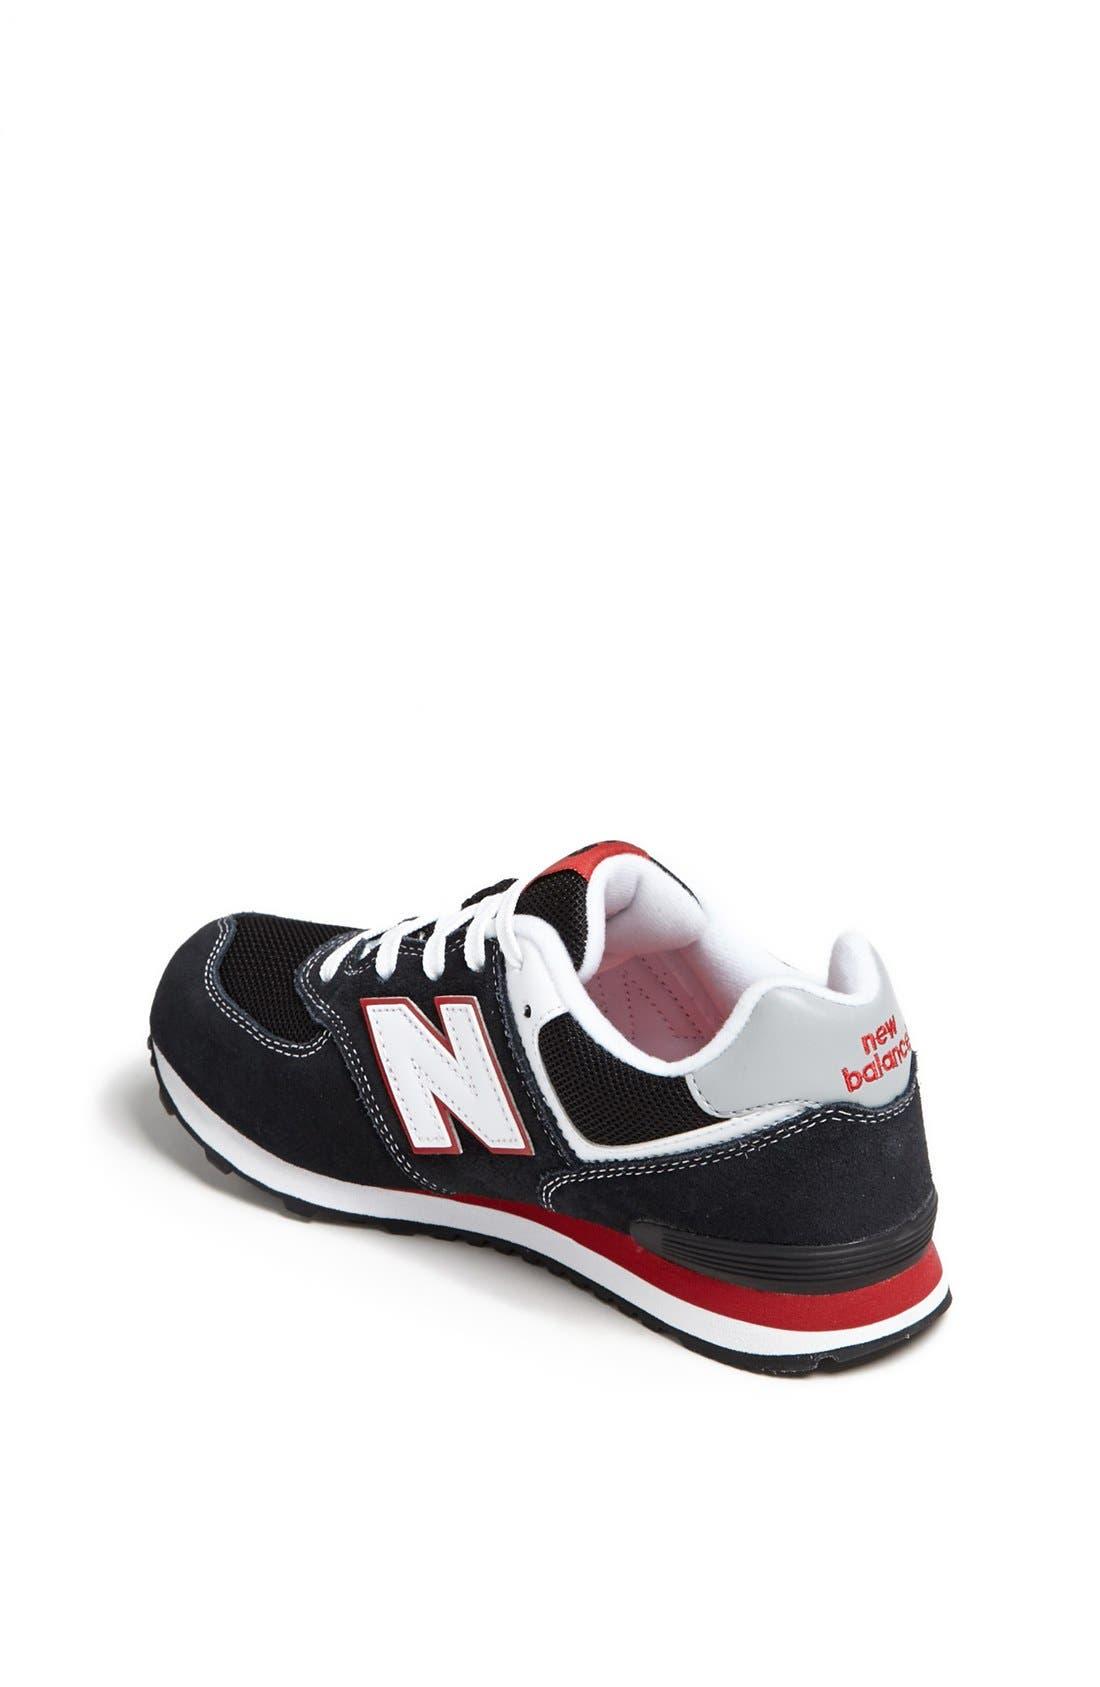 Alternate Image 2  - New Balance '574 Classic' Sneaker (Baby, Walker, Toddler, Little Kid & Big Kid)